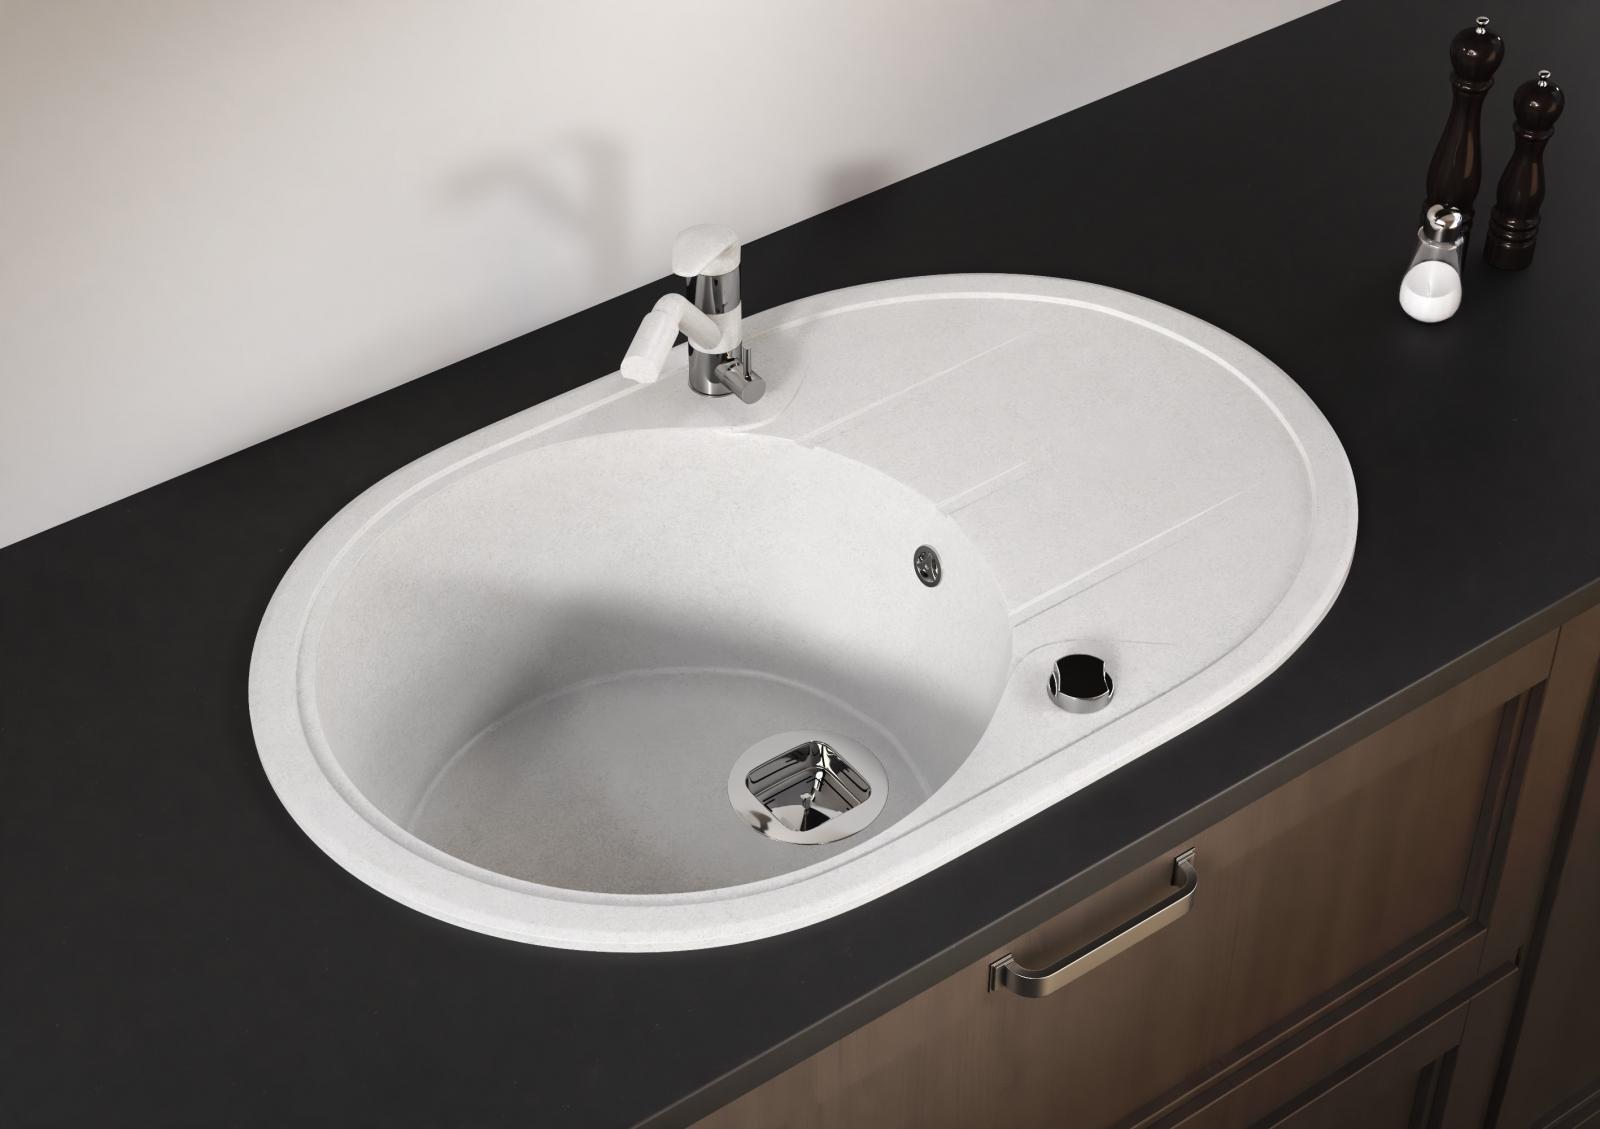 Мойка Tolero-R-116-001, цвет – серый металлик